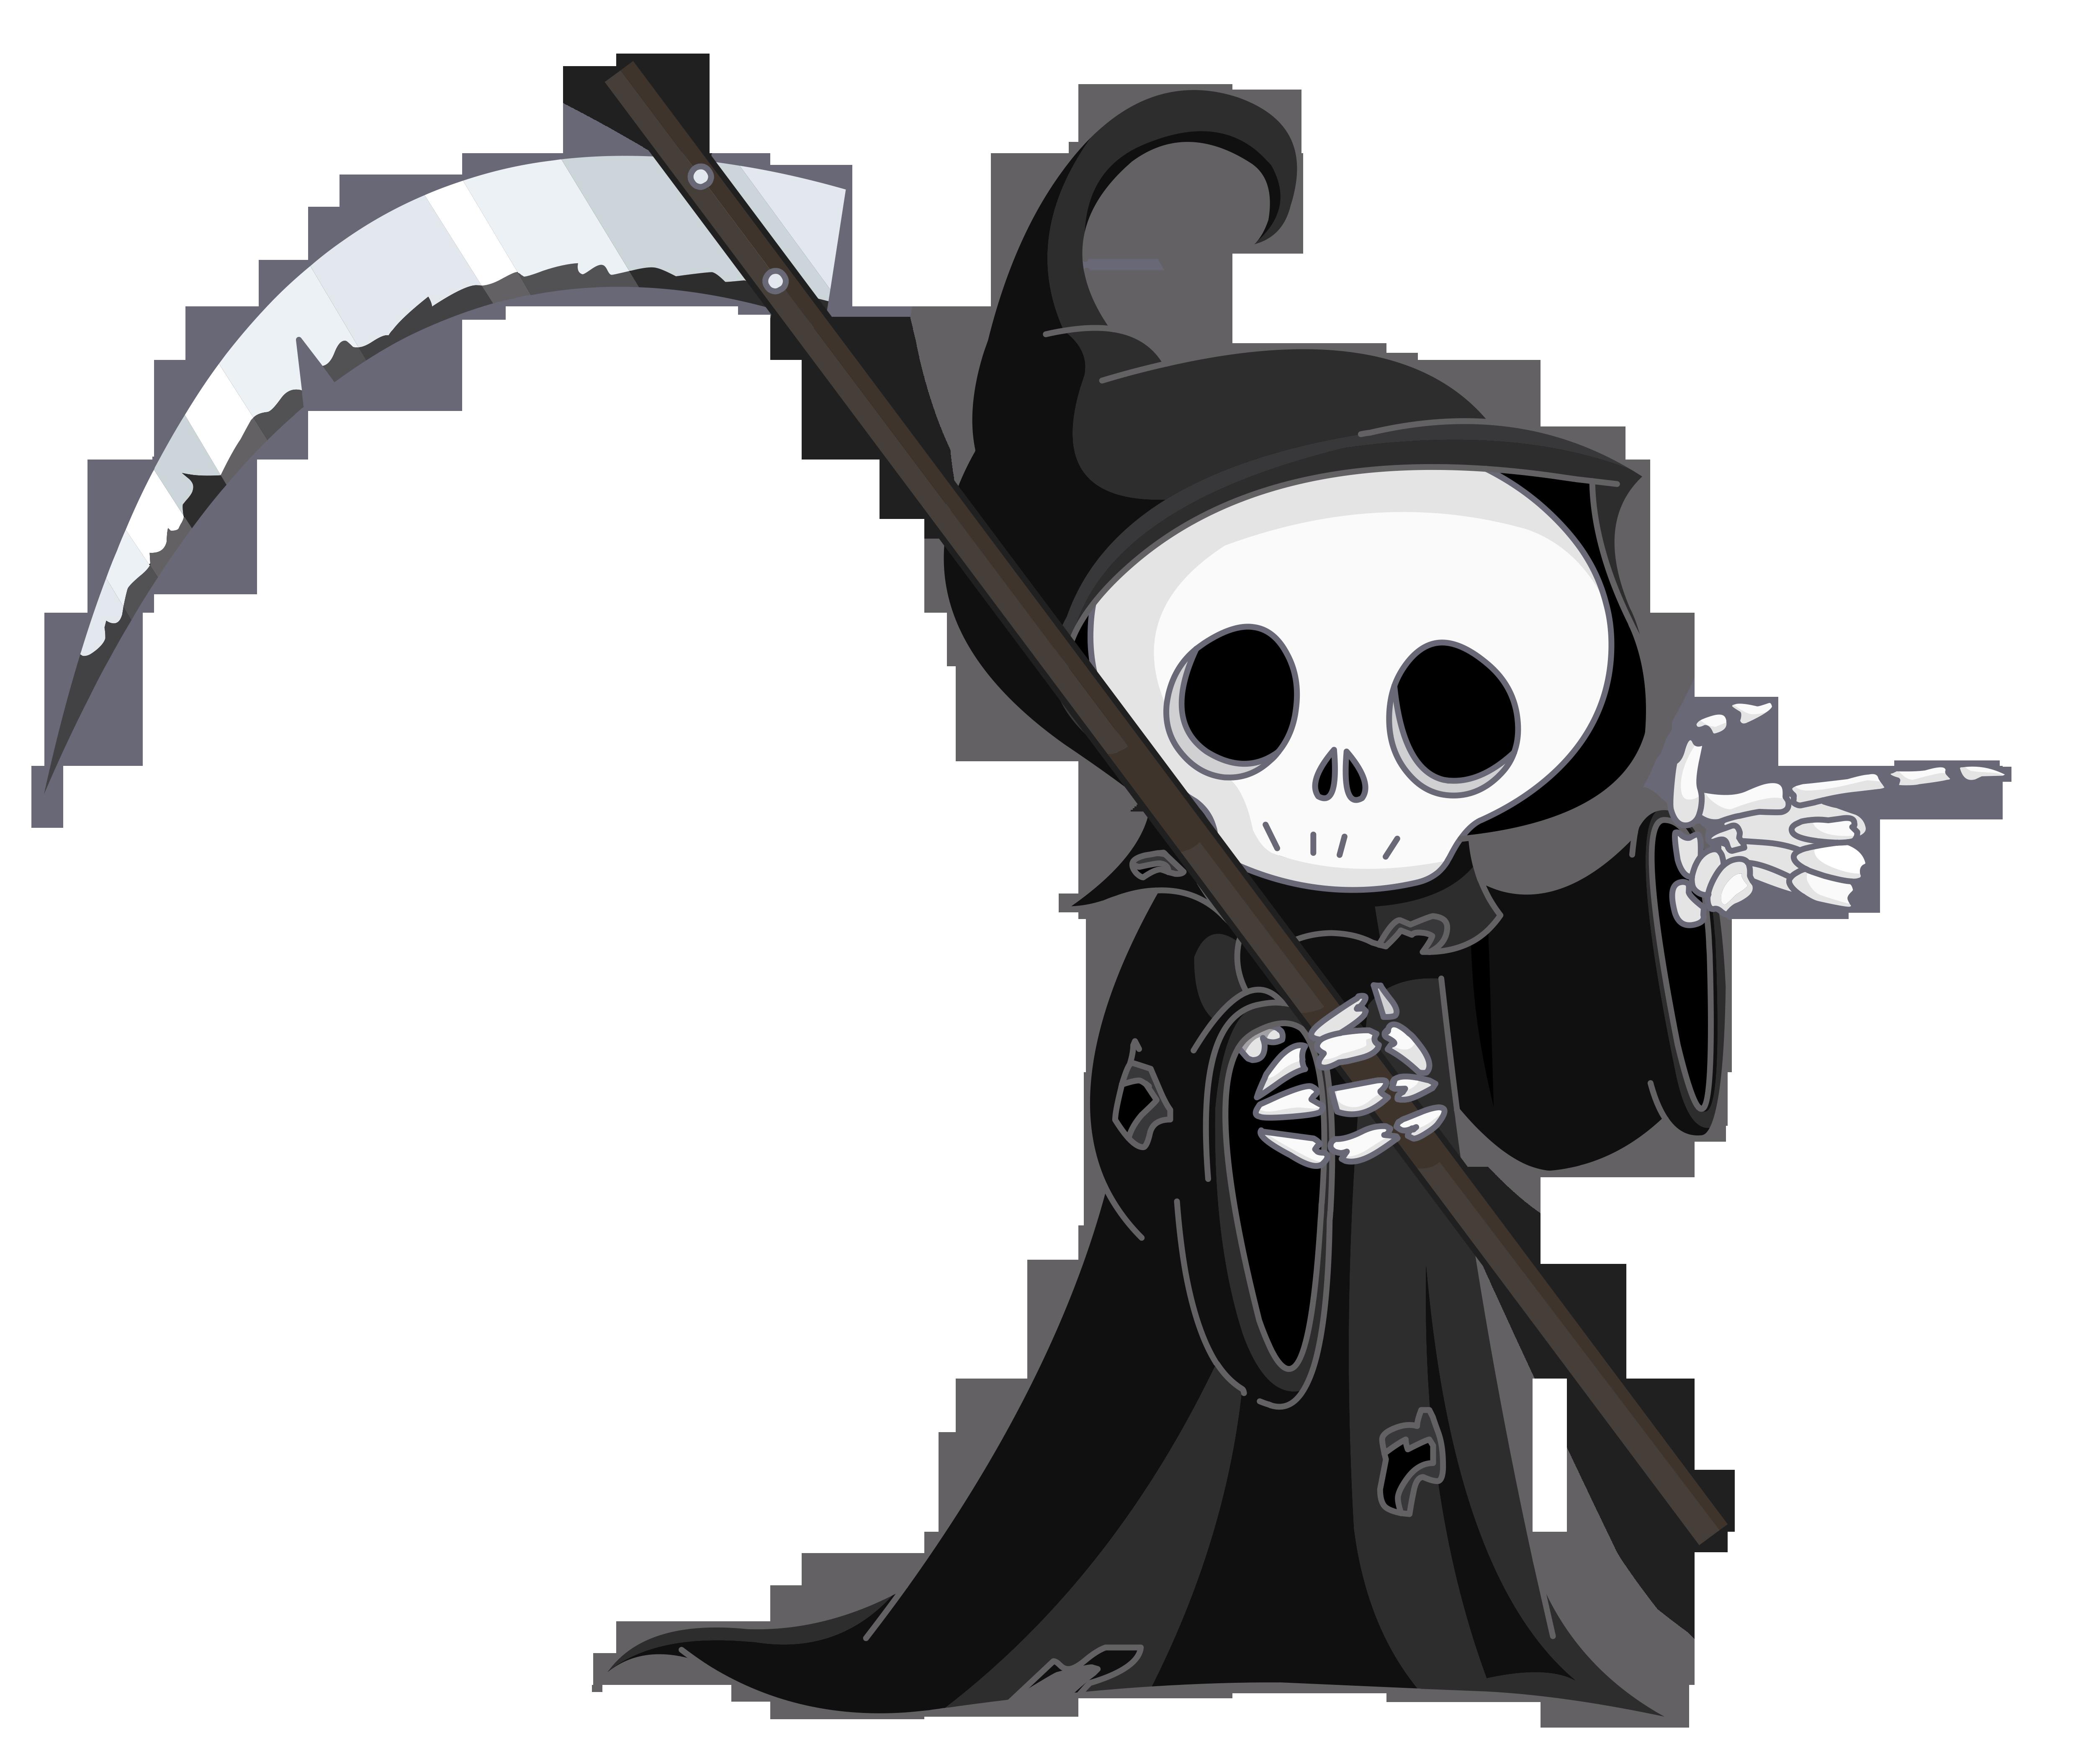 Grim Reaper Png Clipart Grim Reaper Tattoo Grim Reaper Cute Fantasy Creatures